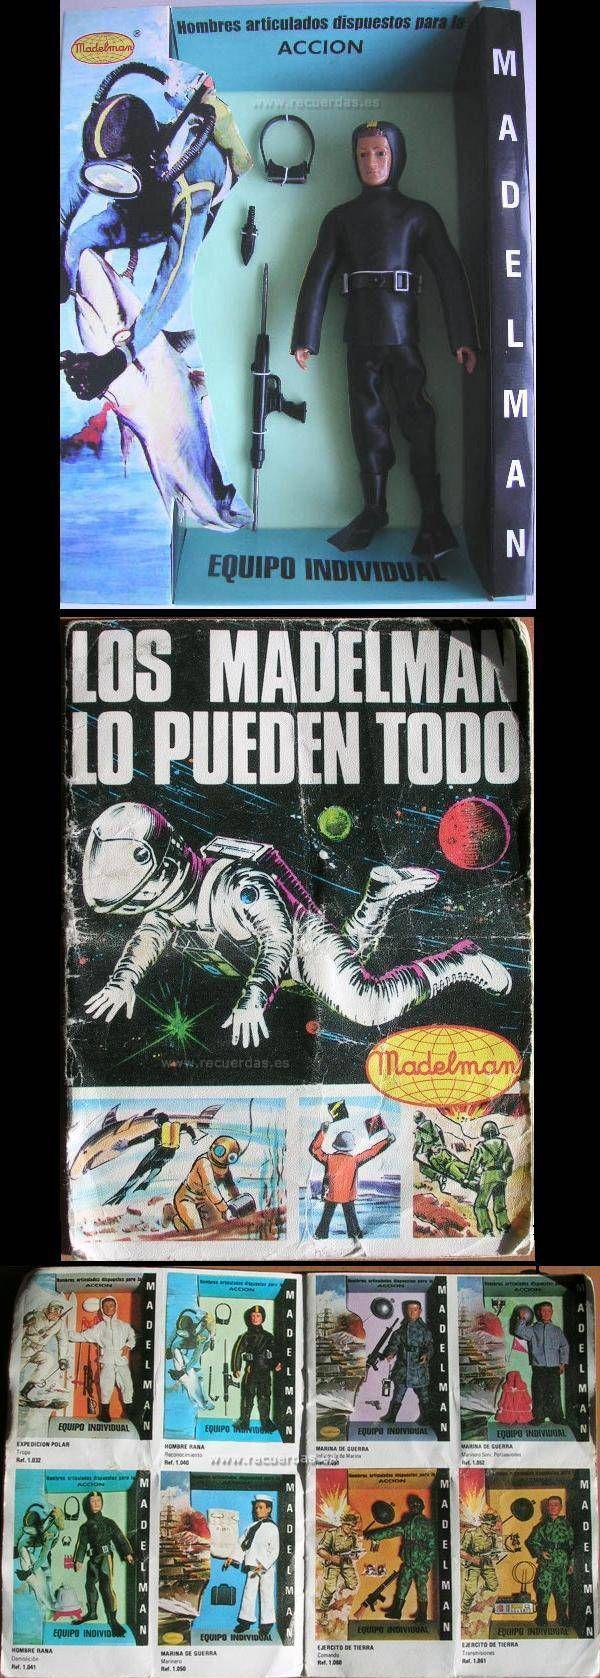 Madelman Hombre rana-Juguetes antiguos